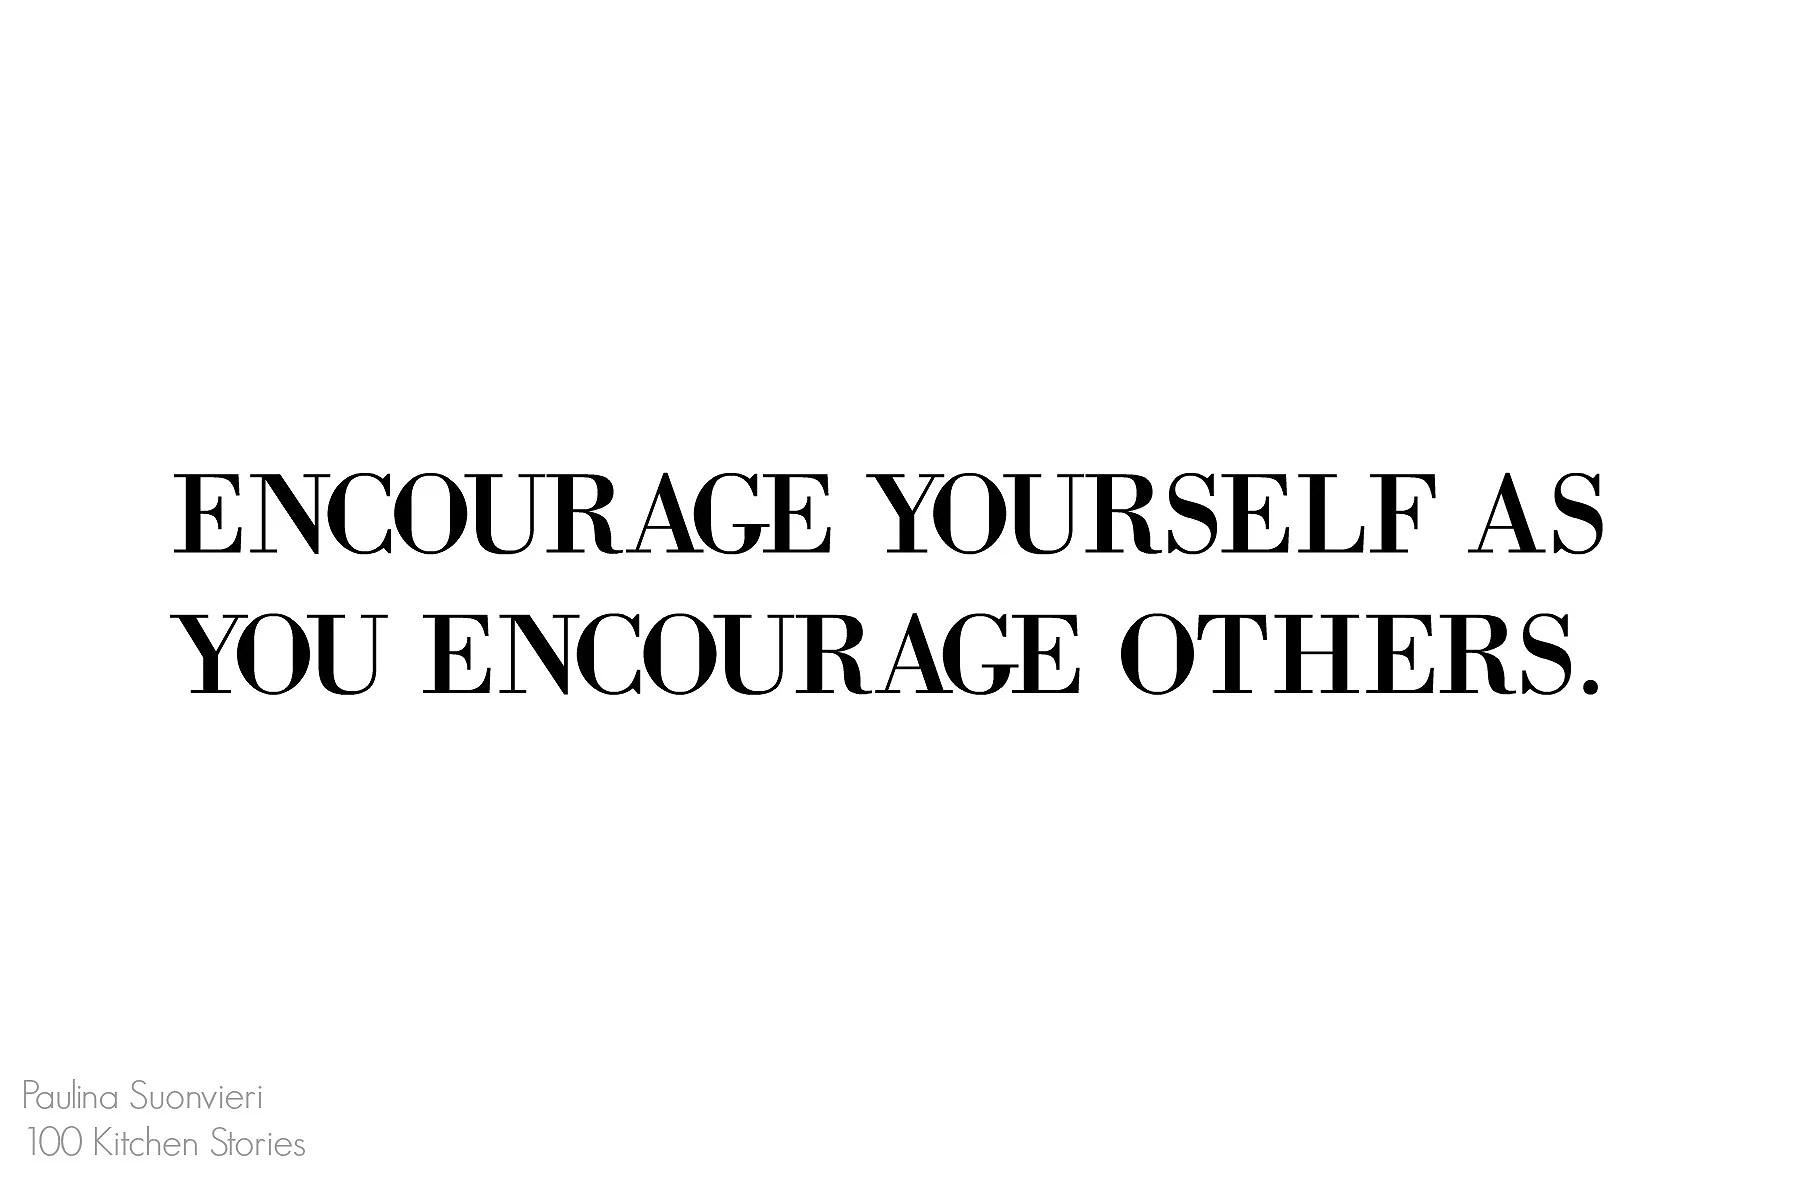 Encourage Yourself as You Encourage Others